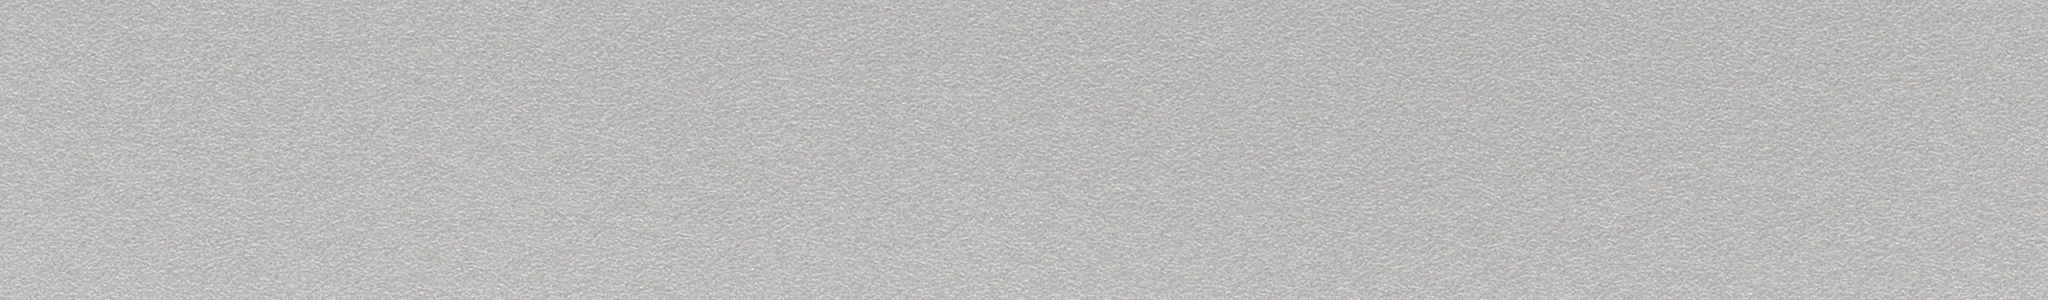 HD 297015 ABS Edge Metallic Grey Smooth Gloss 90°